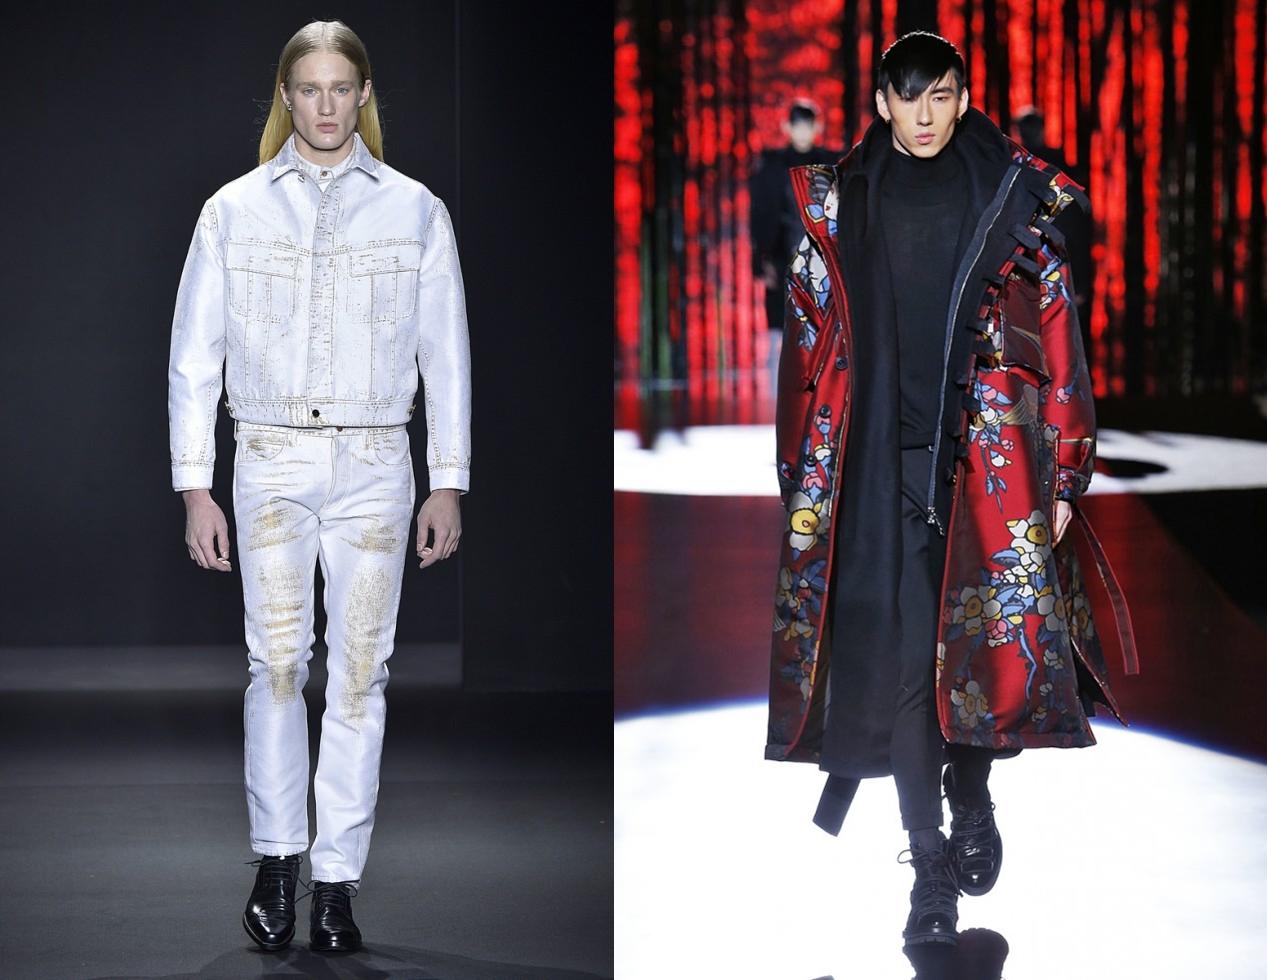 milan fashion week, review, trend, tendencia masculina, moda masculina, style, estilo, alex cursino, moda sem censura, blogger, fashion blogger, blog, menswear, social media, digital influencer, 5